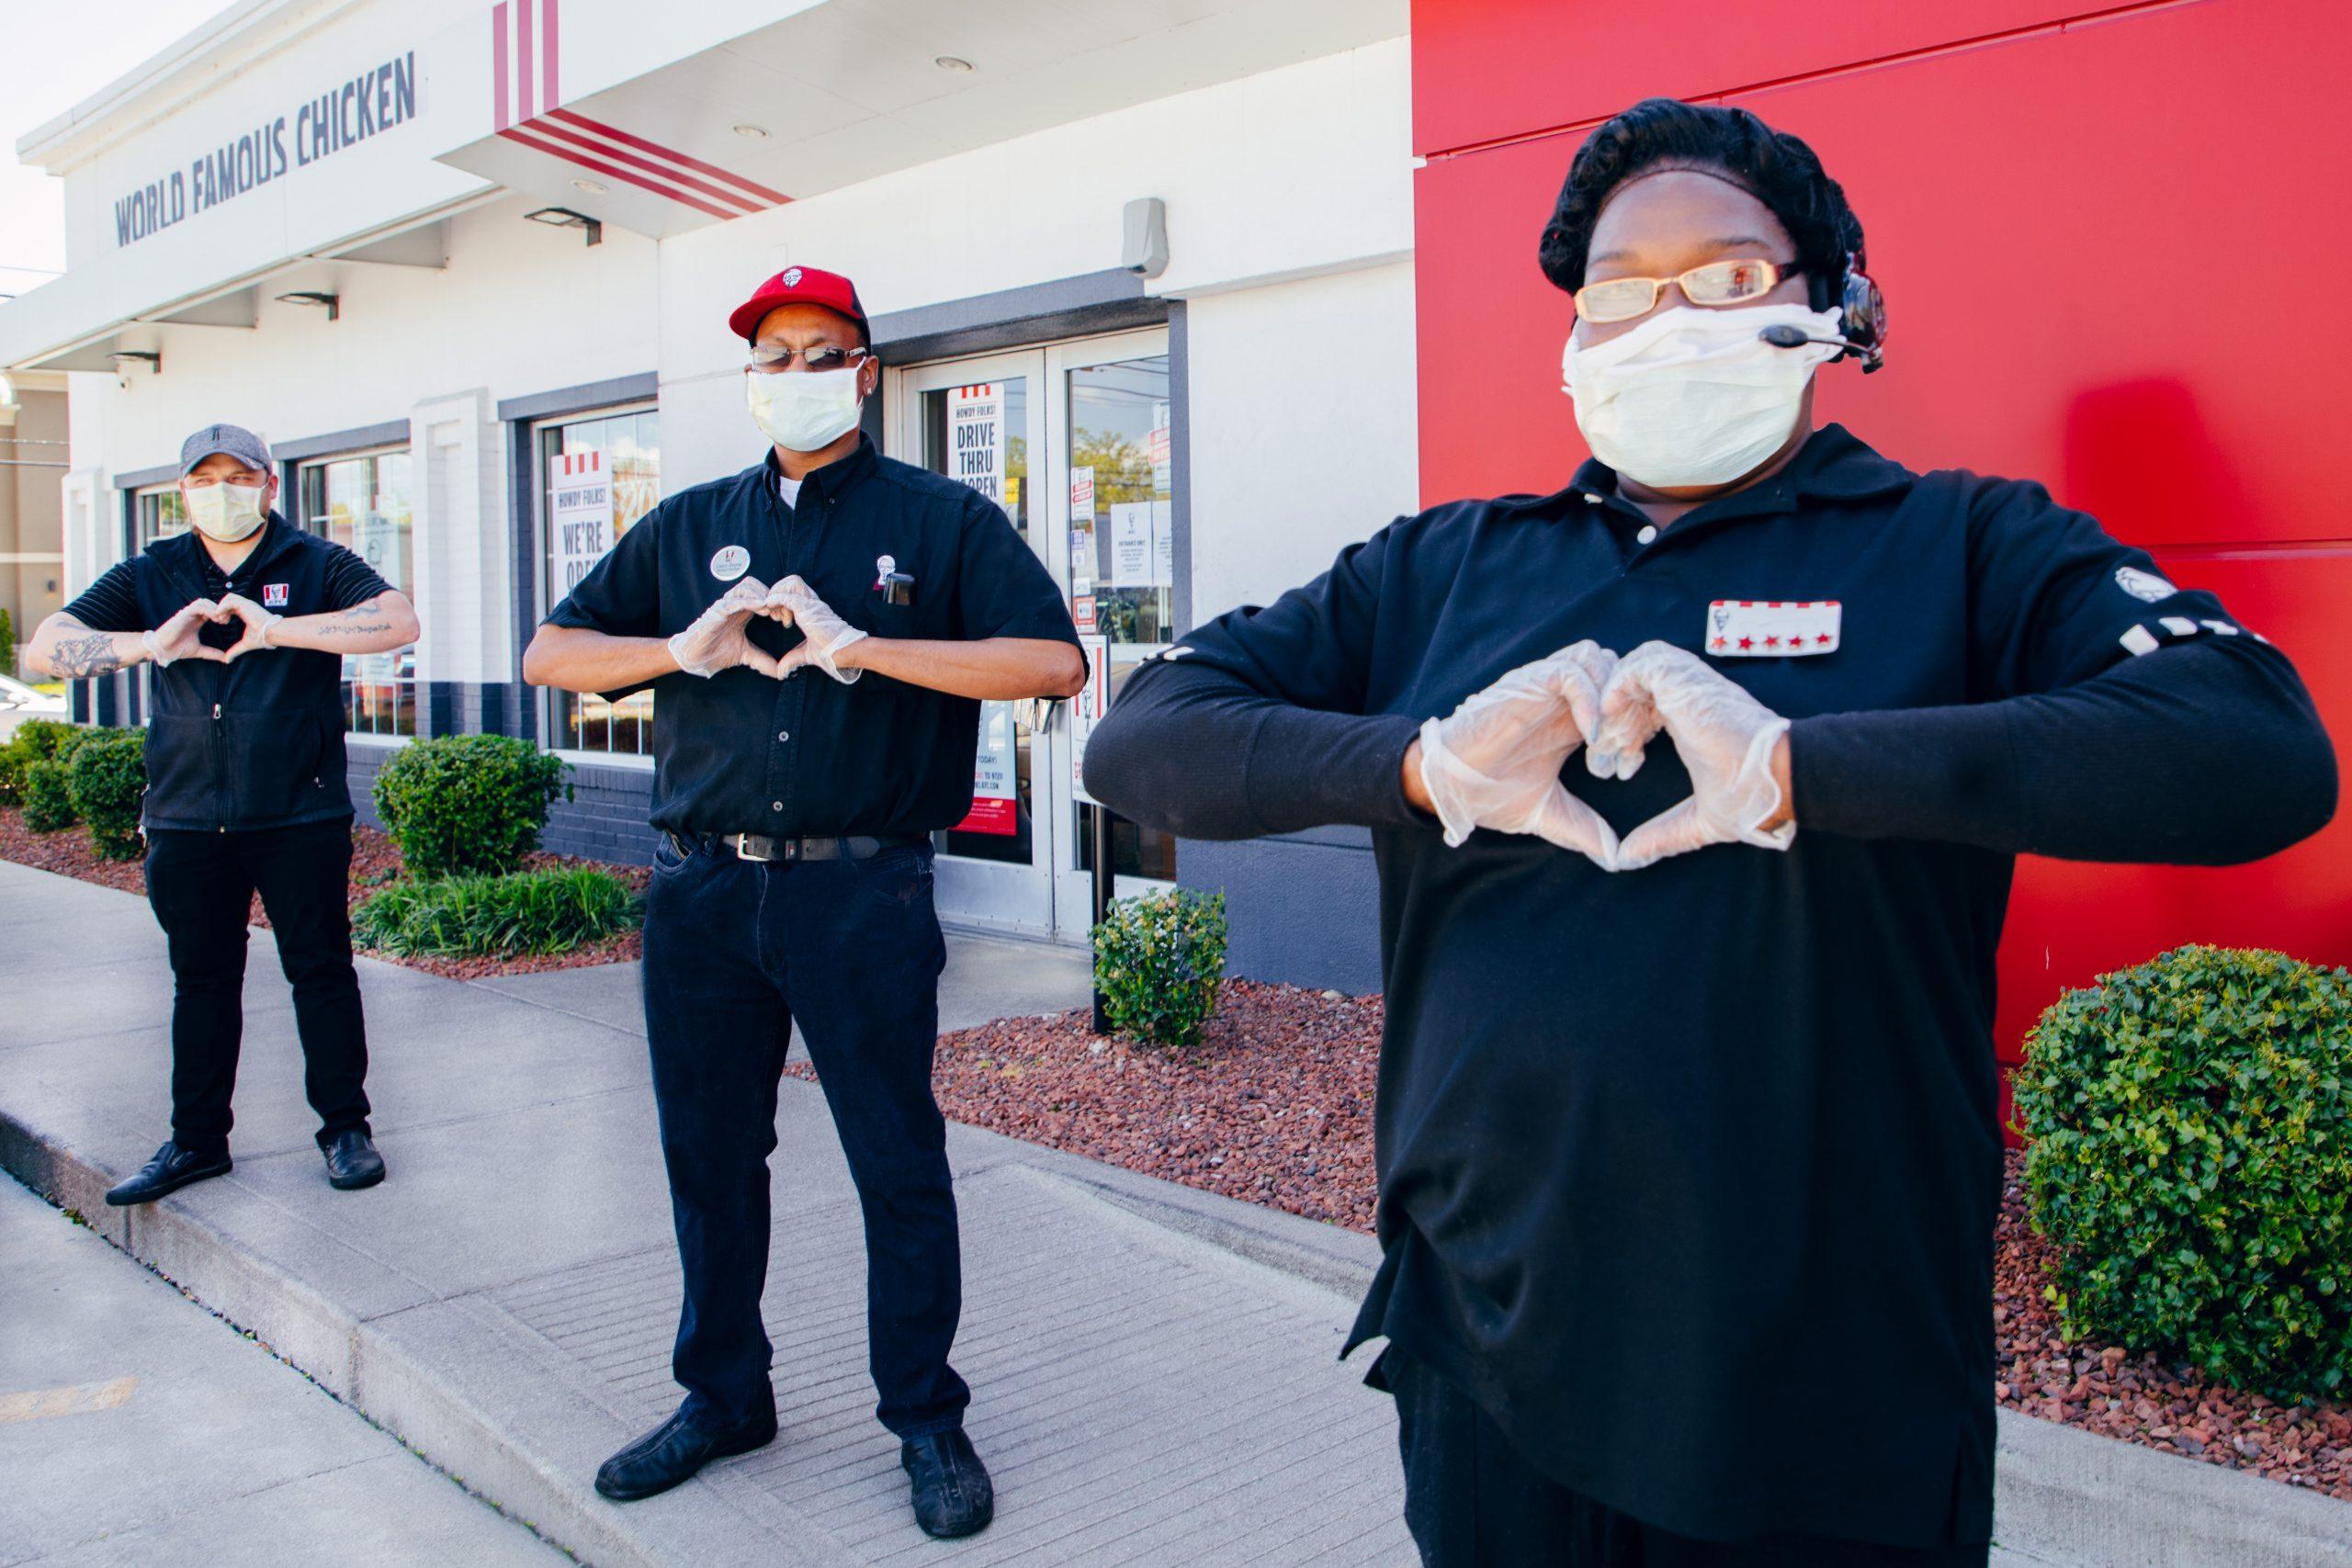 KFC Feeding Our Communities